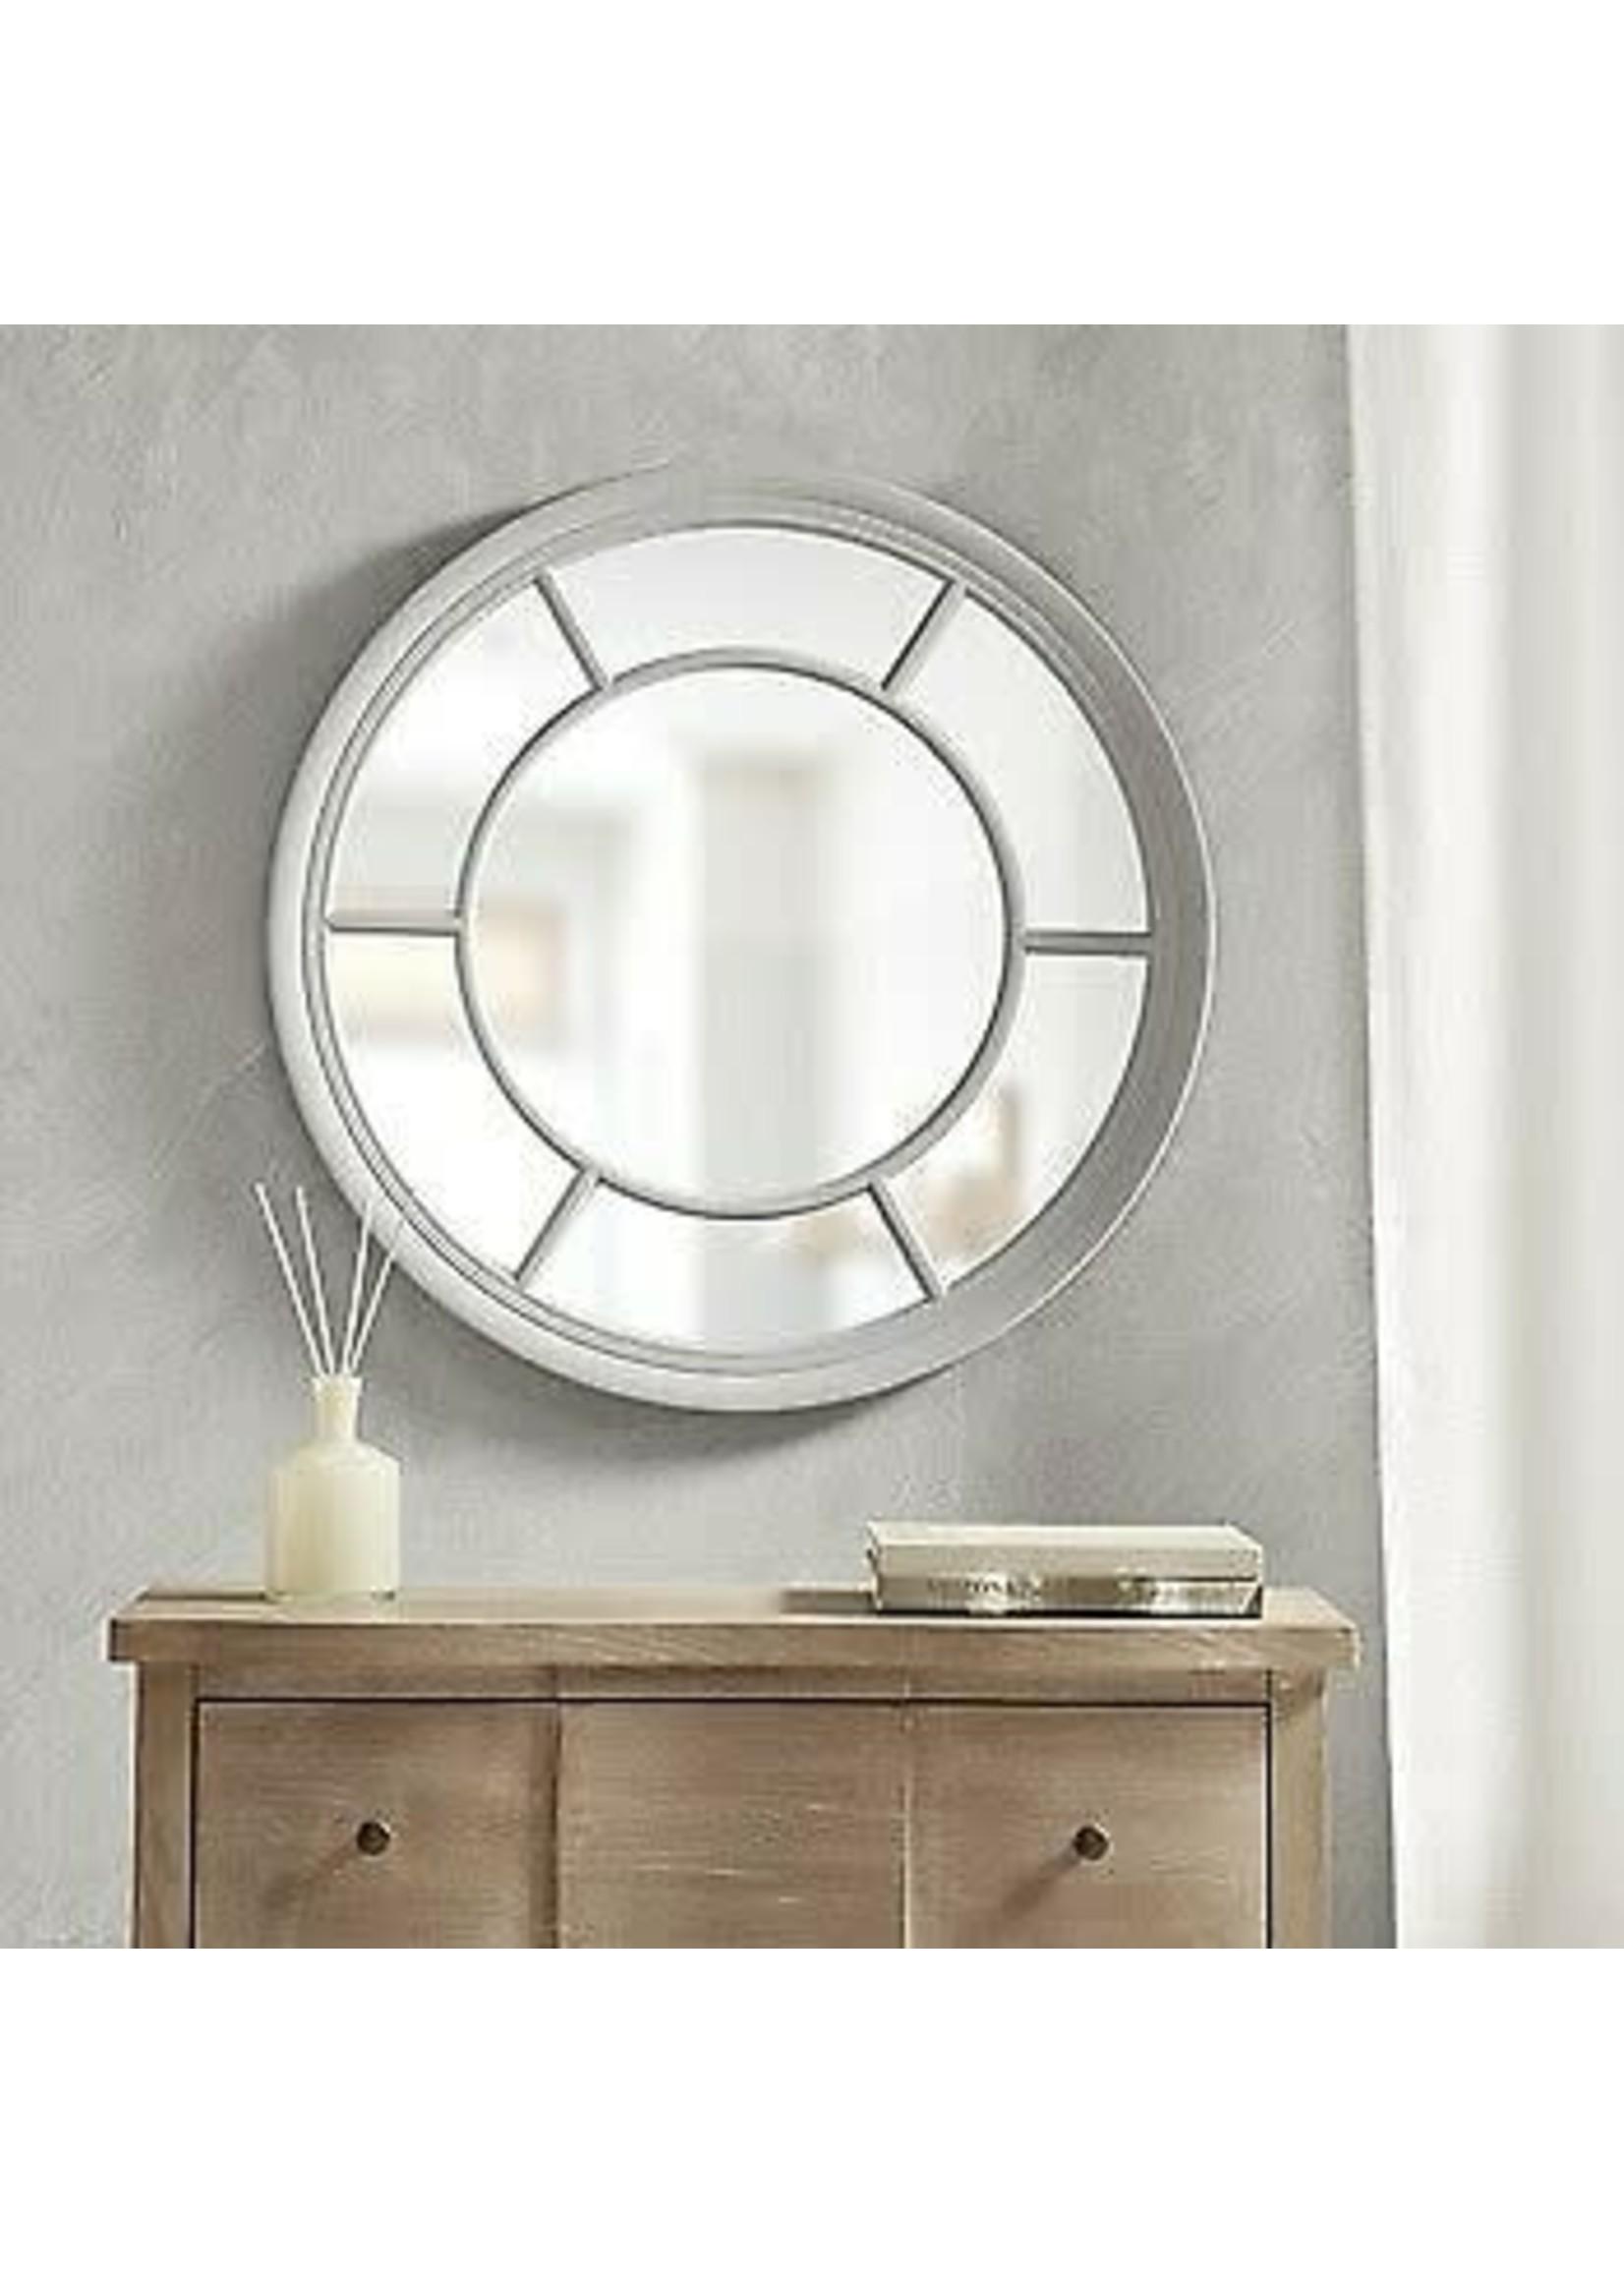 Olliix OLLIIX Terellis Round Accent Mirror Grey